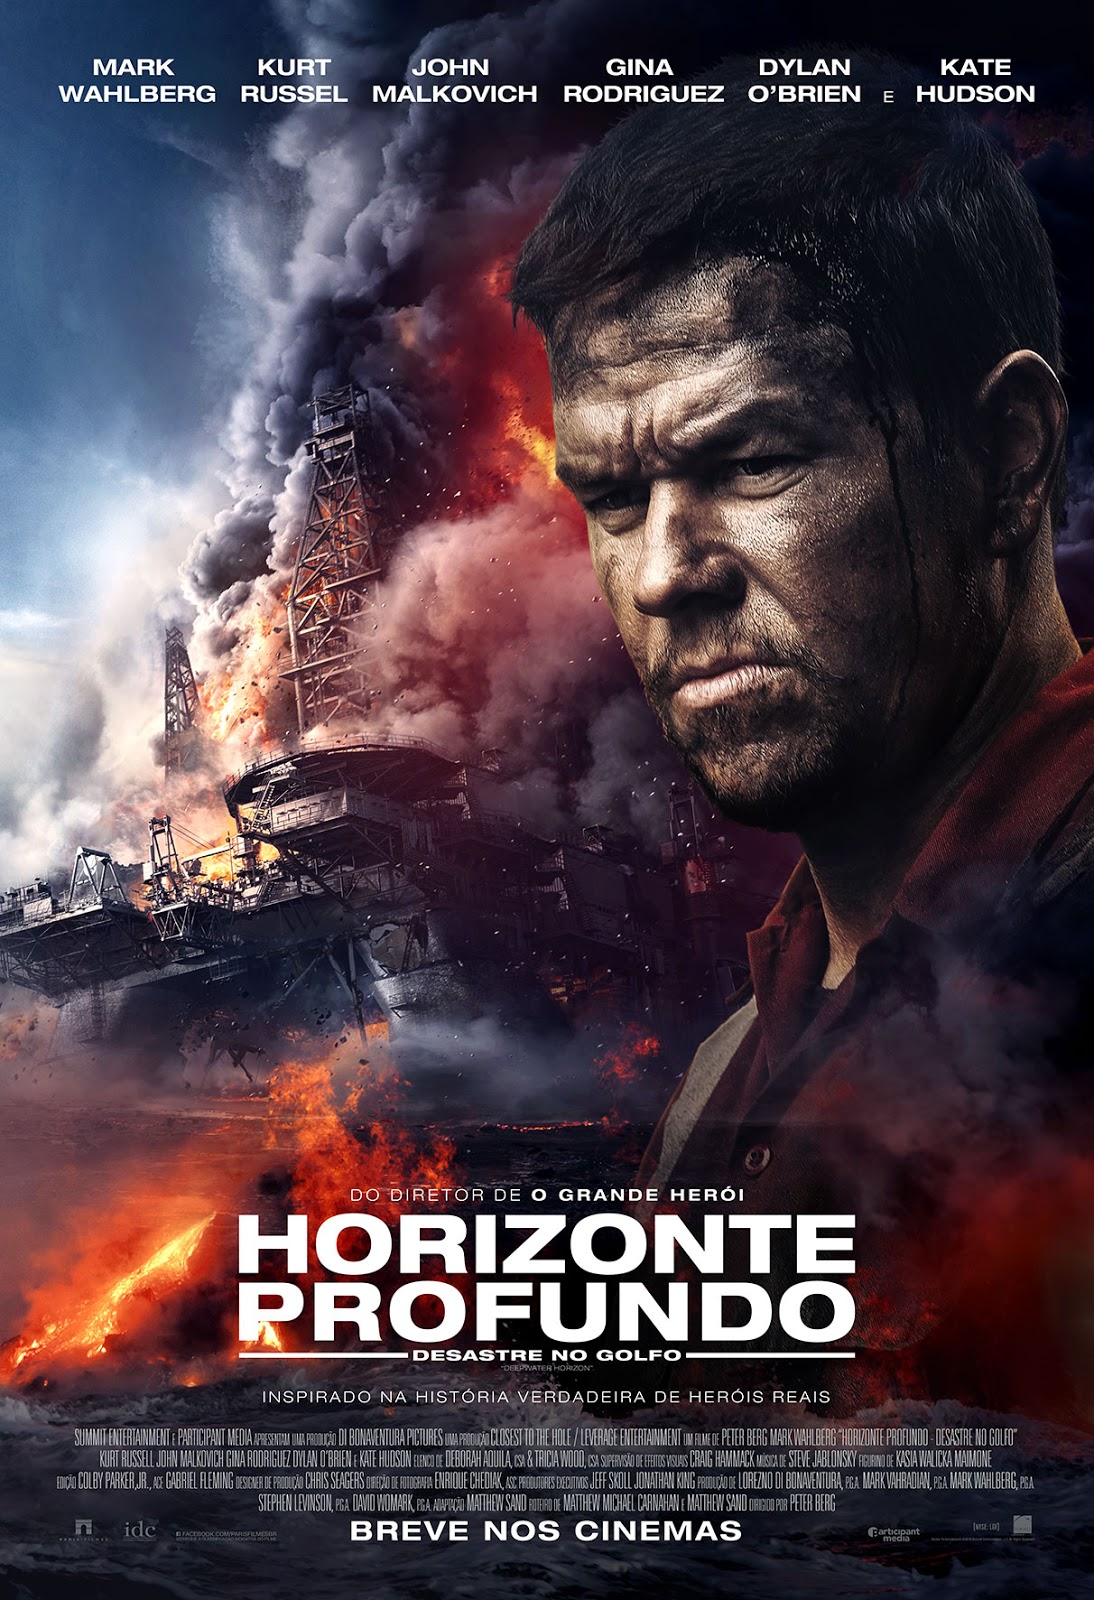 Horizonte Profundo - Desastre no Golfo - Filme 2016 - AdoroCinema